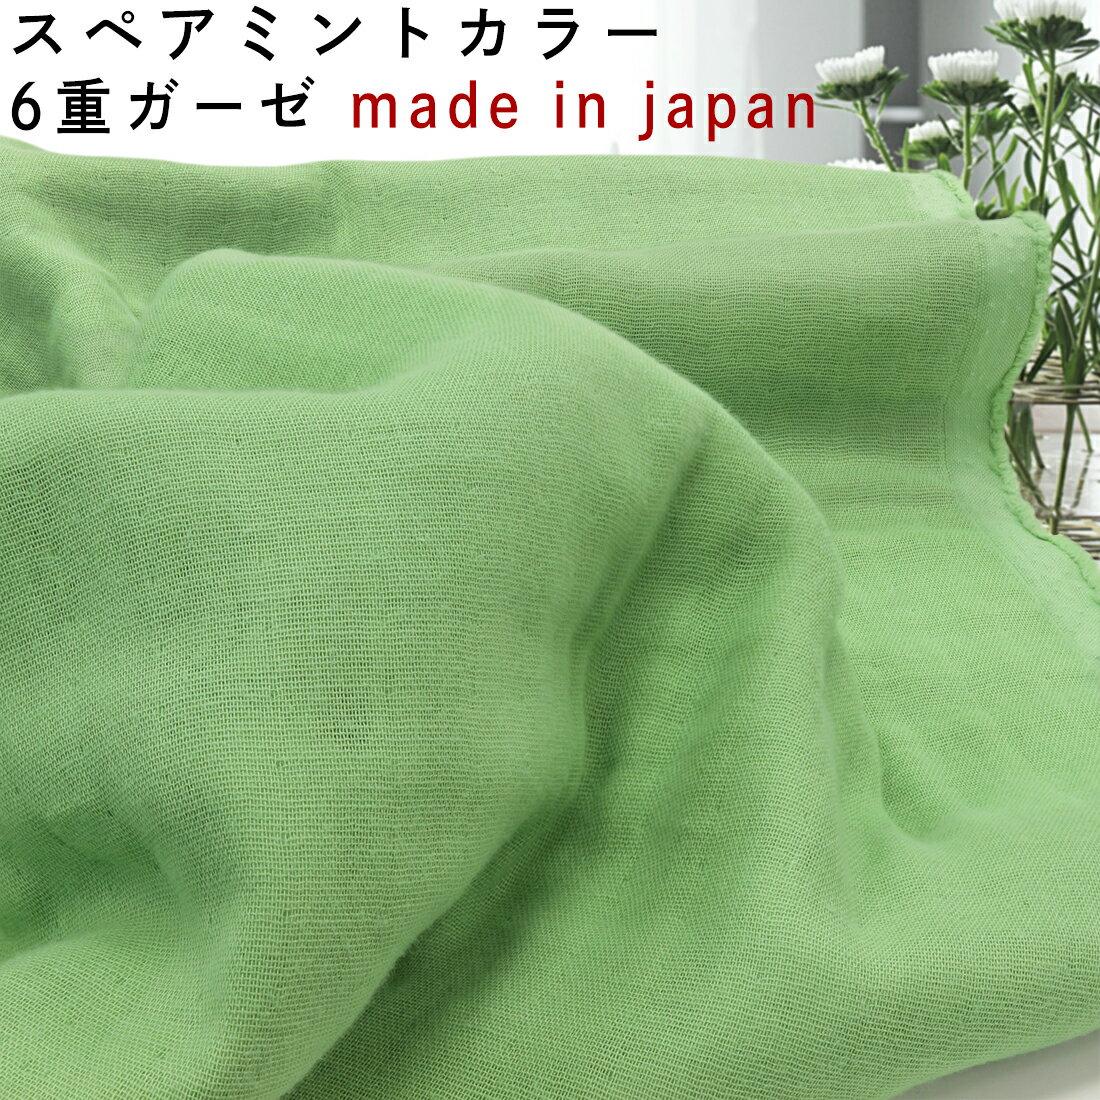 【HINODEYAオリジナル】日本製。綿100%のカラー6重ガーゼ生地【4色】50cm単位【I_1040】【50cmまでネコポス(メール便)発送可】